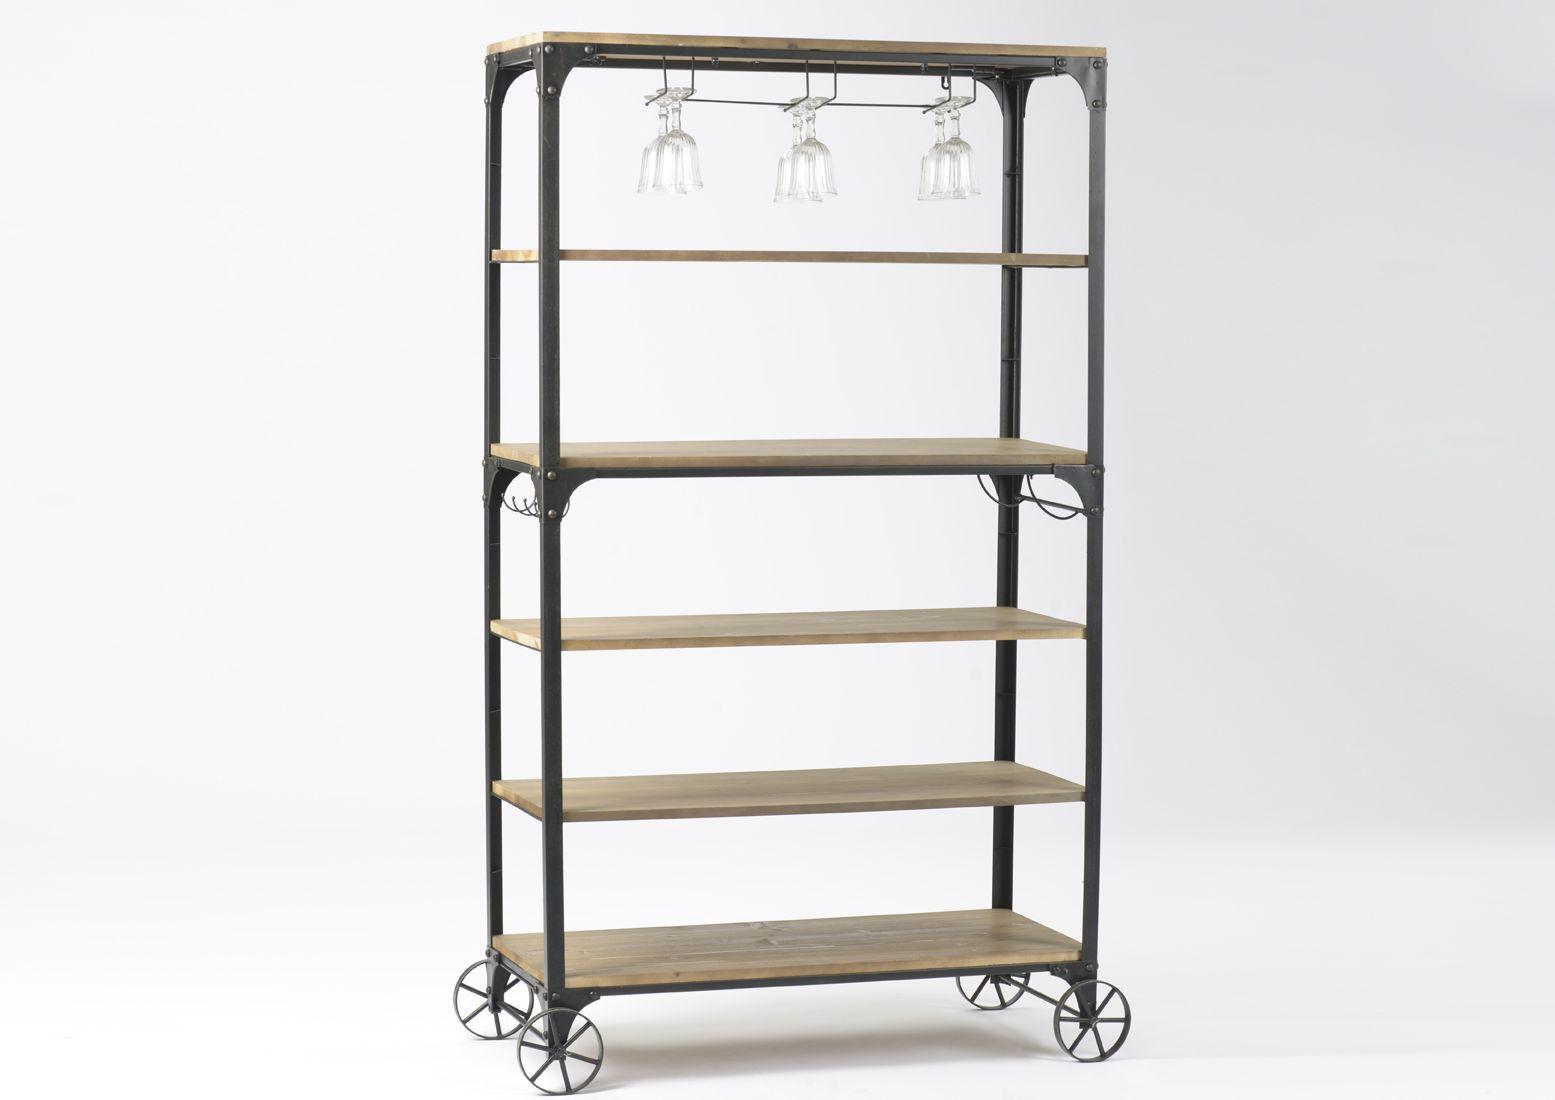 grande tag re bois et m tal sur roulettes. Black Bedroom Furniture Sets. Home Design Ideas